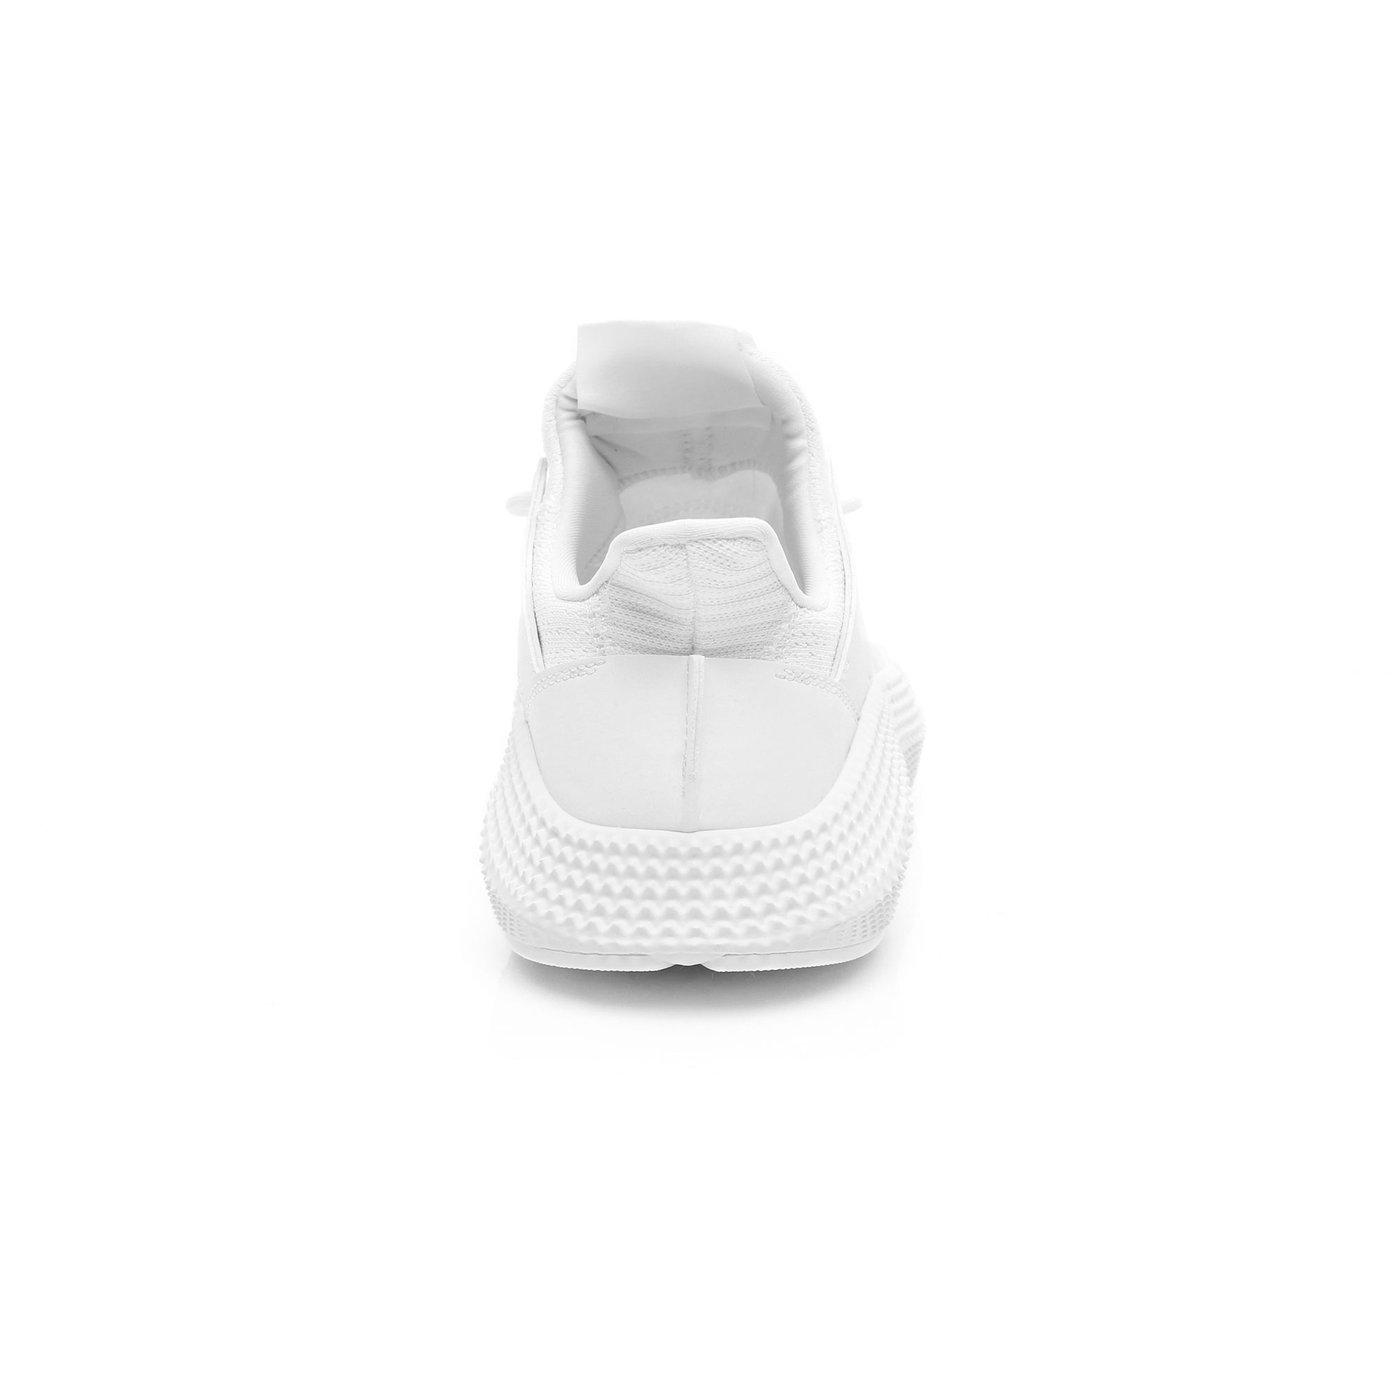 adidas Originals Prophere Kadın Beyaz Spor Ayakkabı